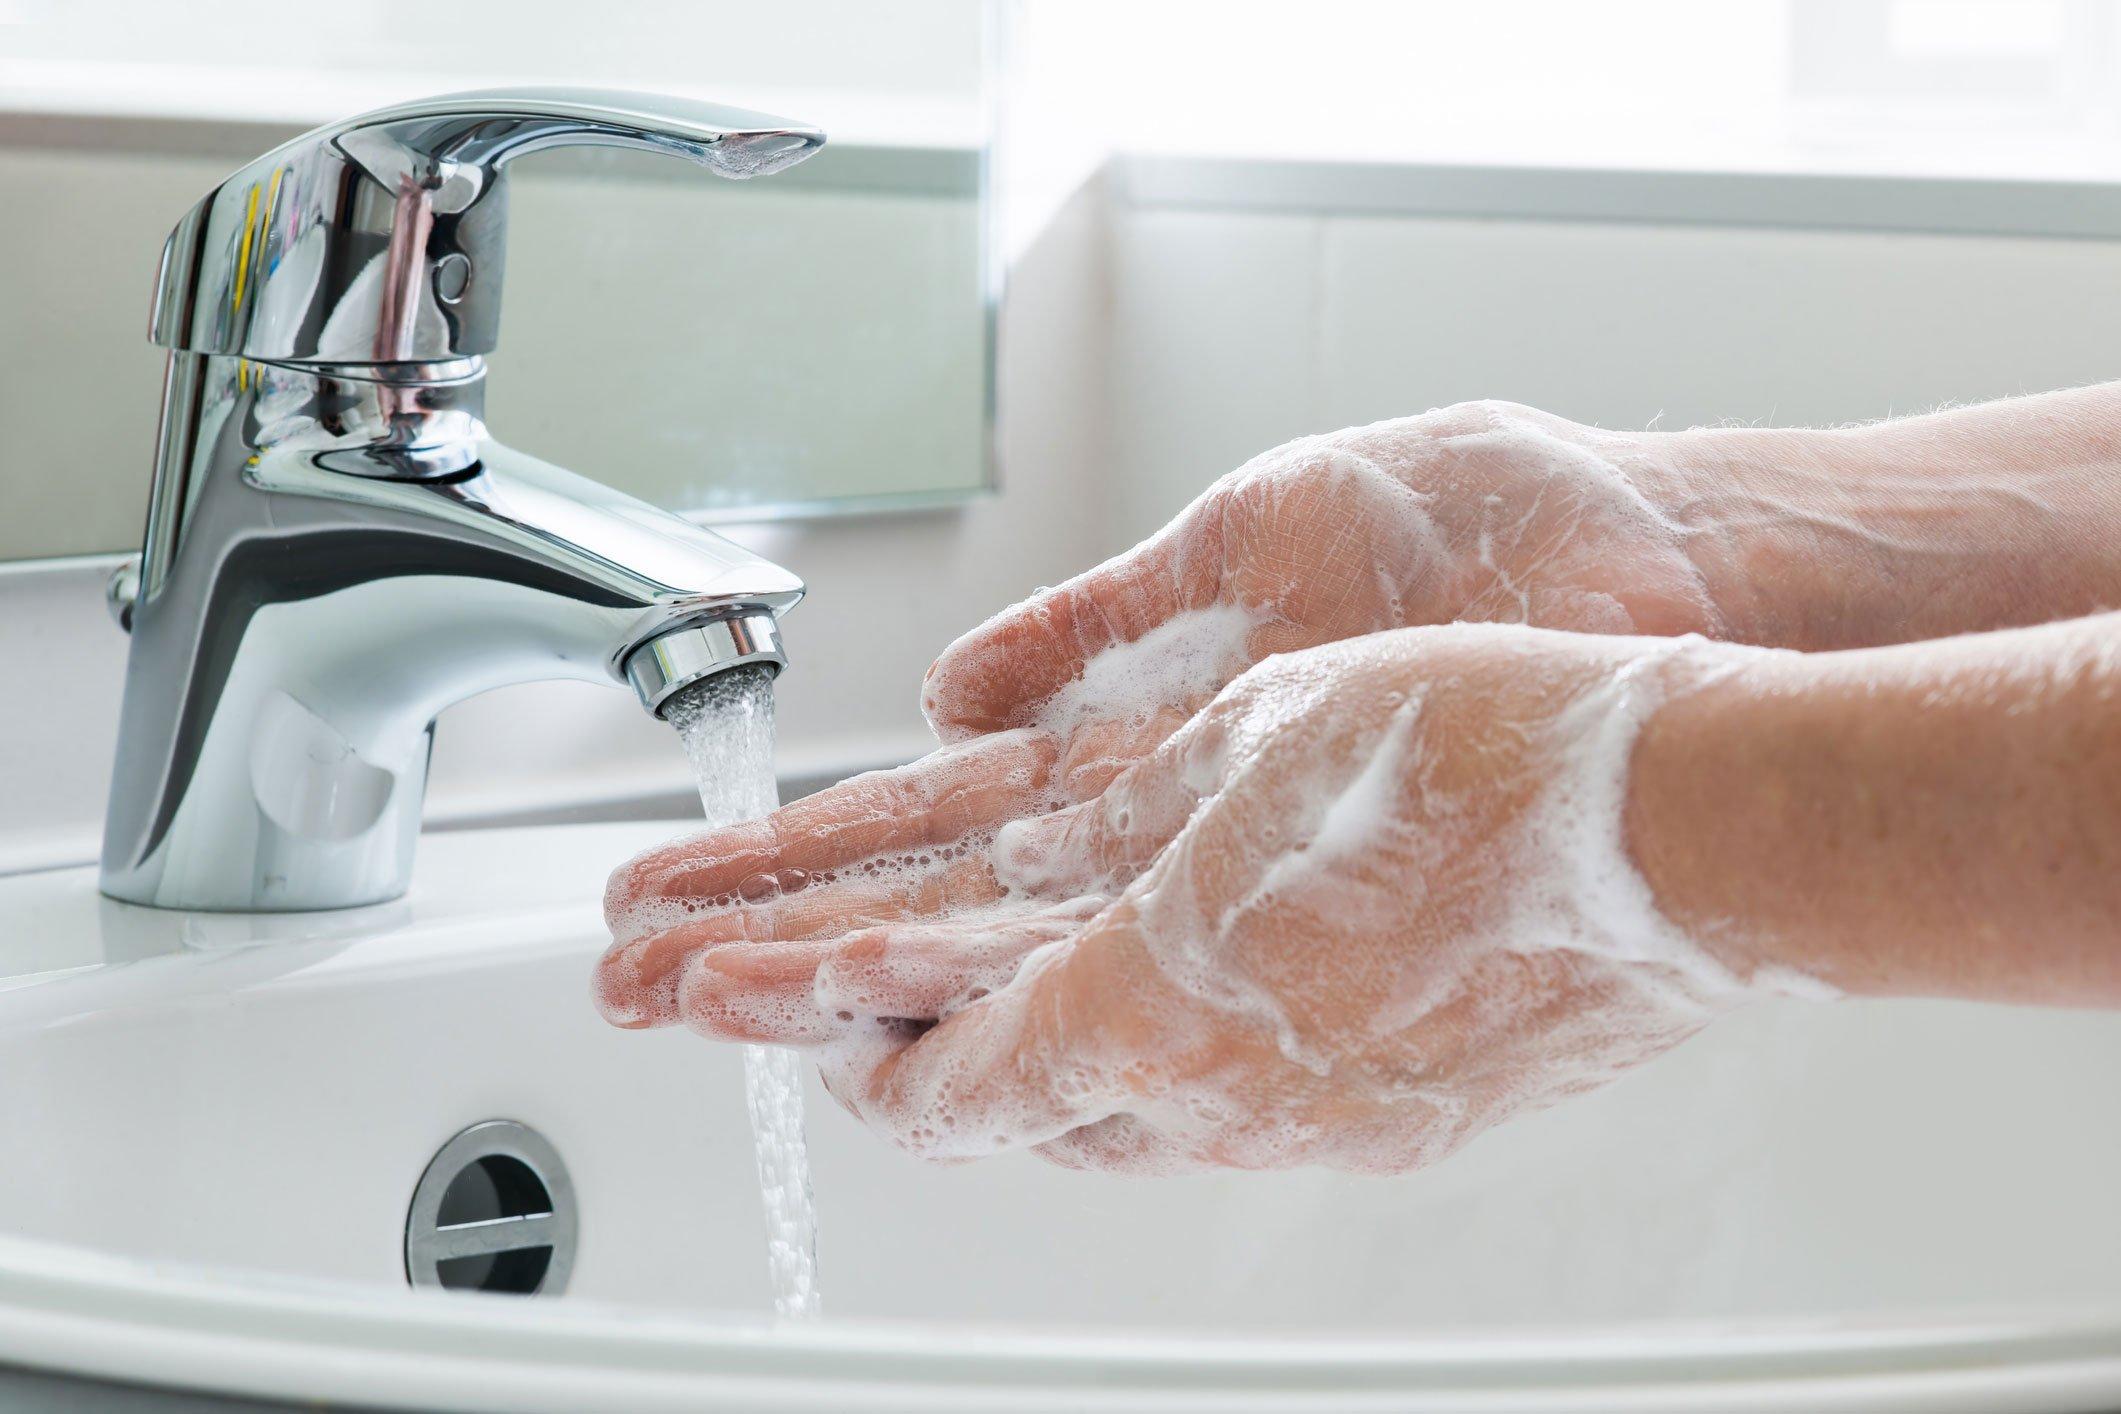 Coronavirus advice washing hands with water and soap